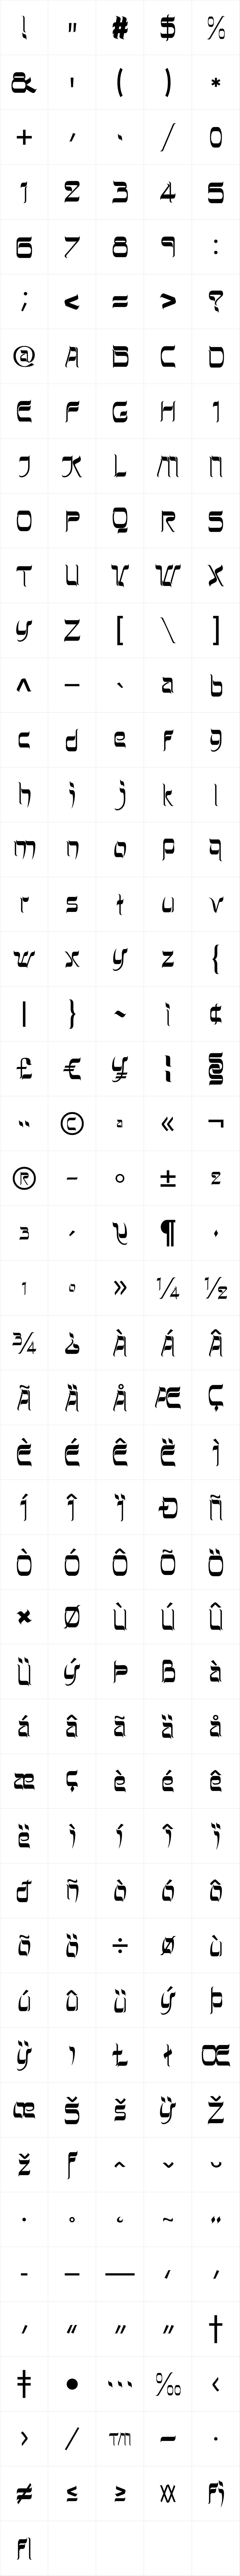 Hebrew Latino Plain